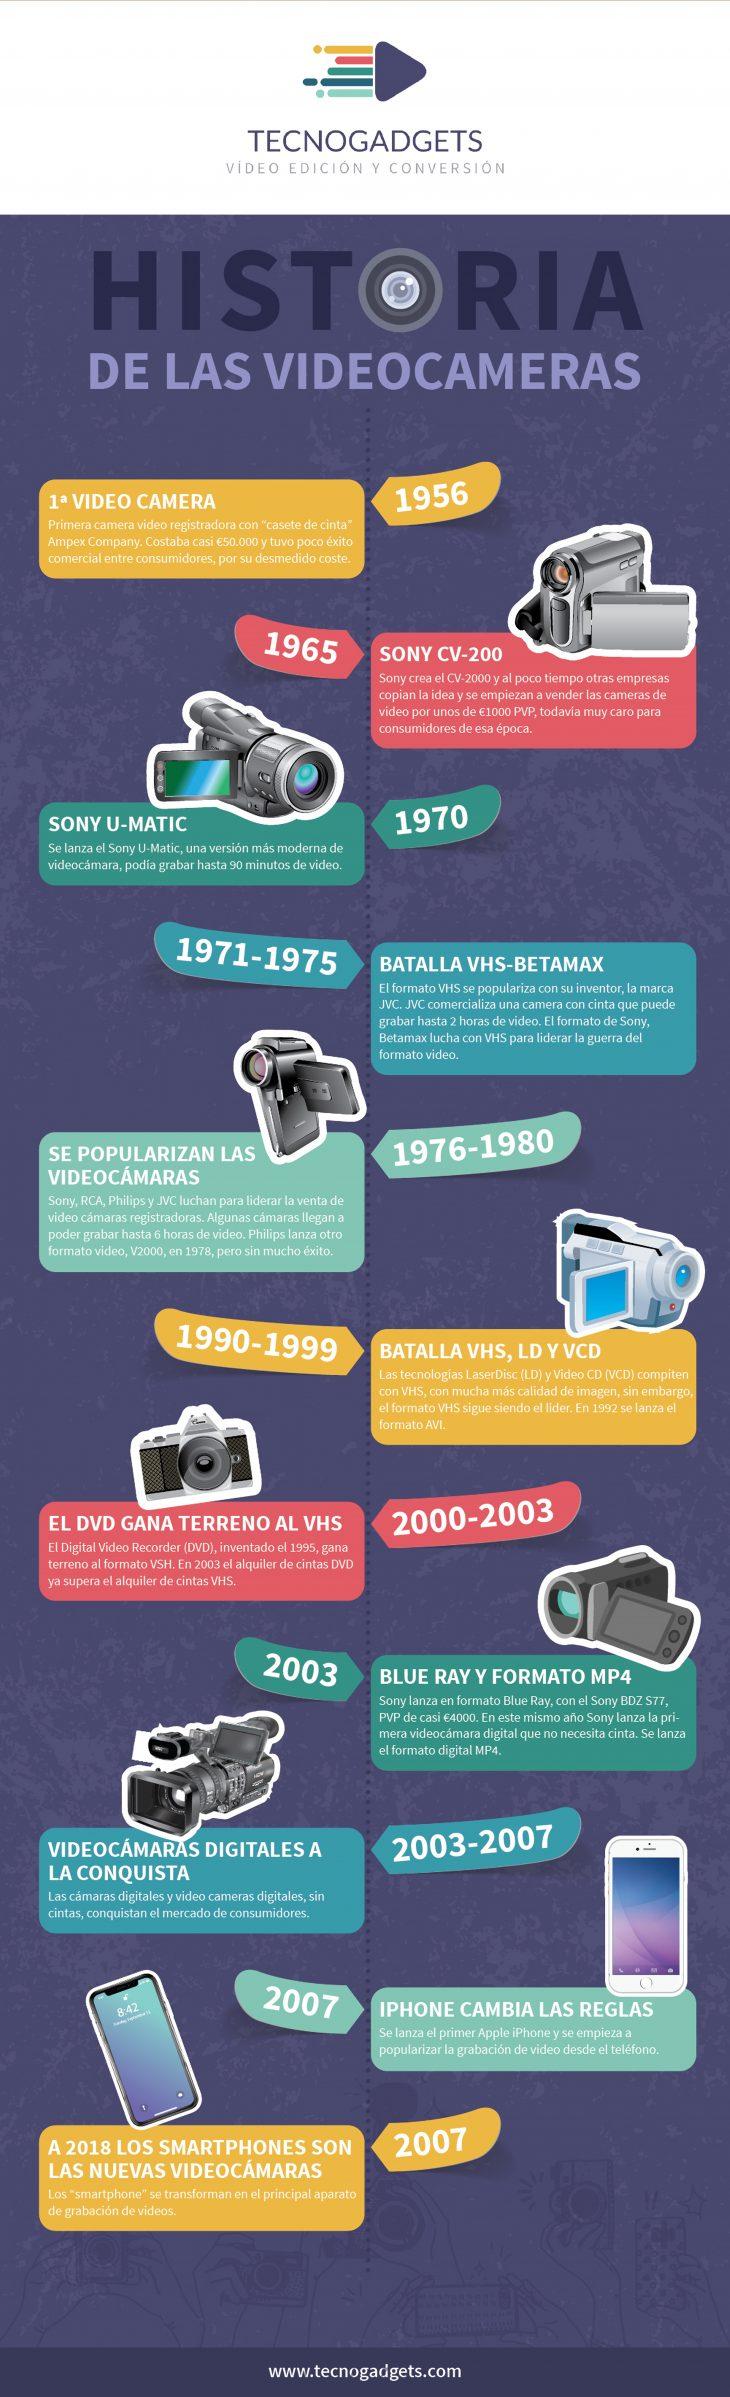 imagen buena Tecnogadgets-Infographic (1)